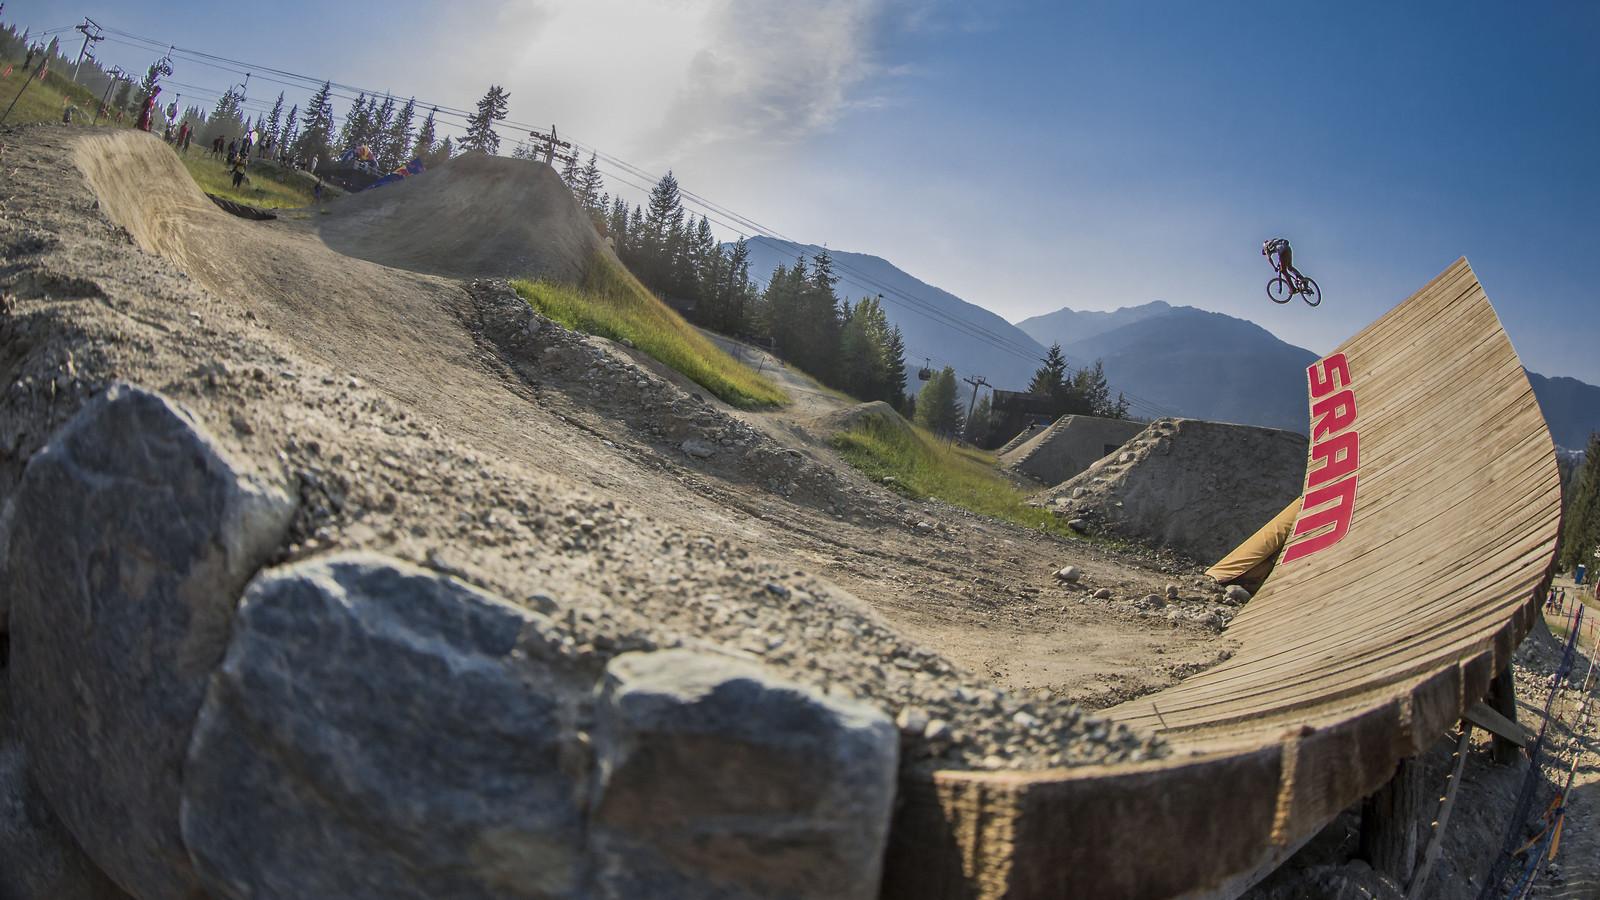 joyride practice 2015 - phunkt.com - Mountain Biking Pictures - Vital MTB